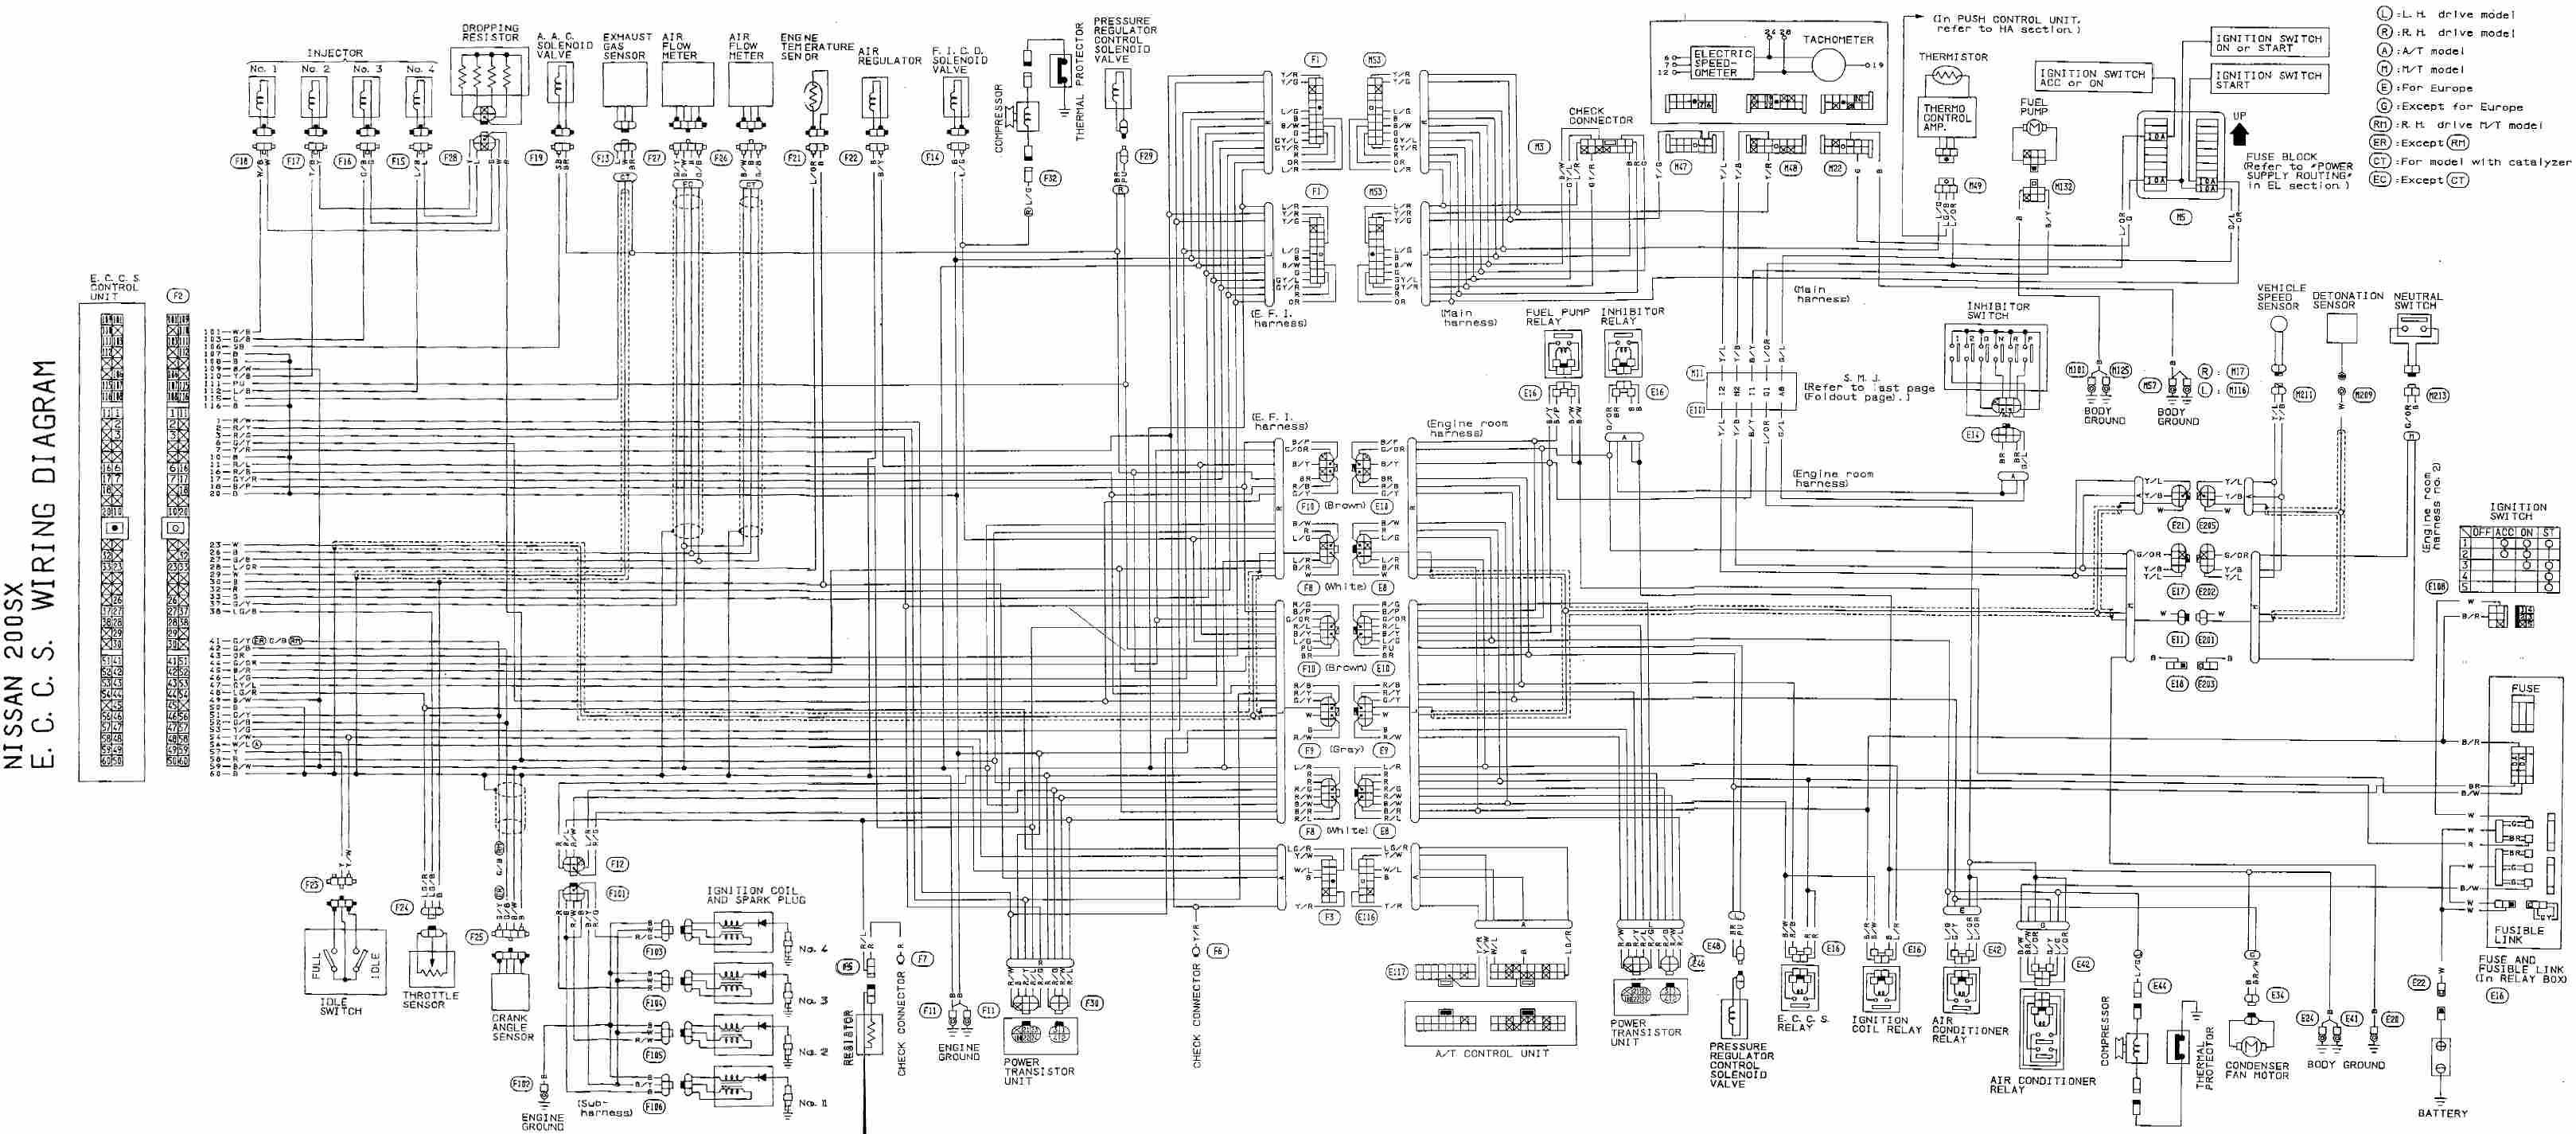 small resolution of nissan atlas wiring diagram wiring library 1987 nissan wiring schematics nissan wiring schematics